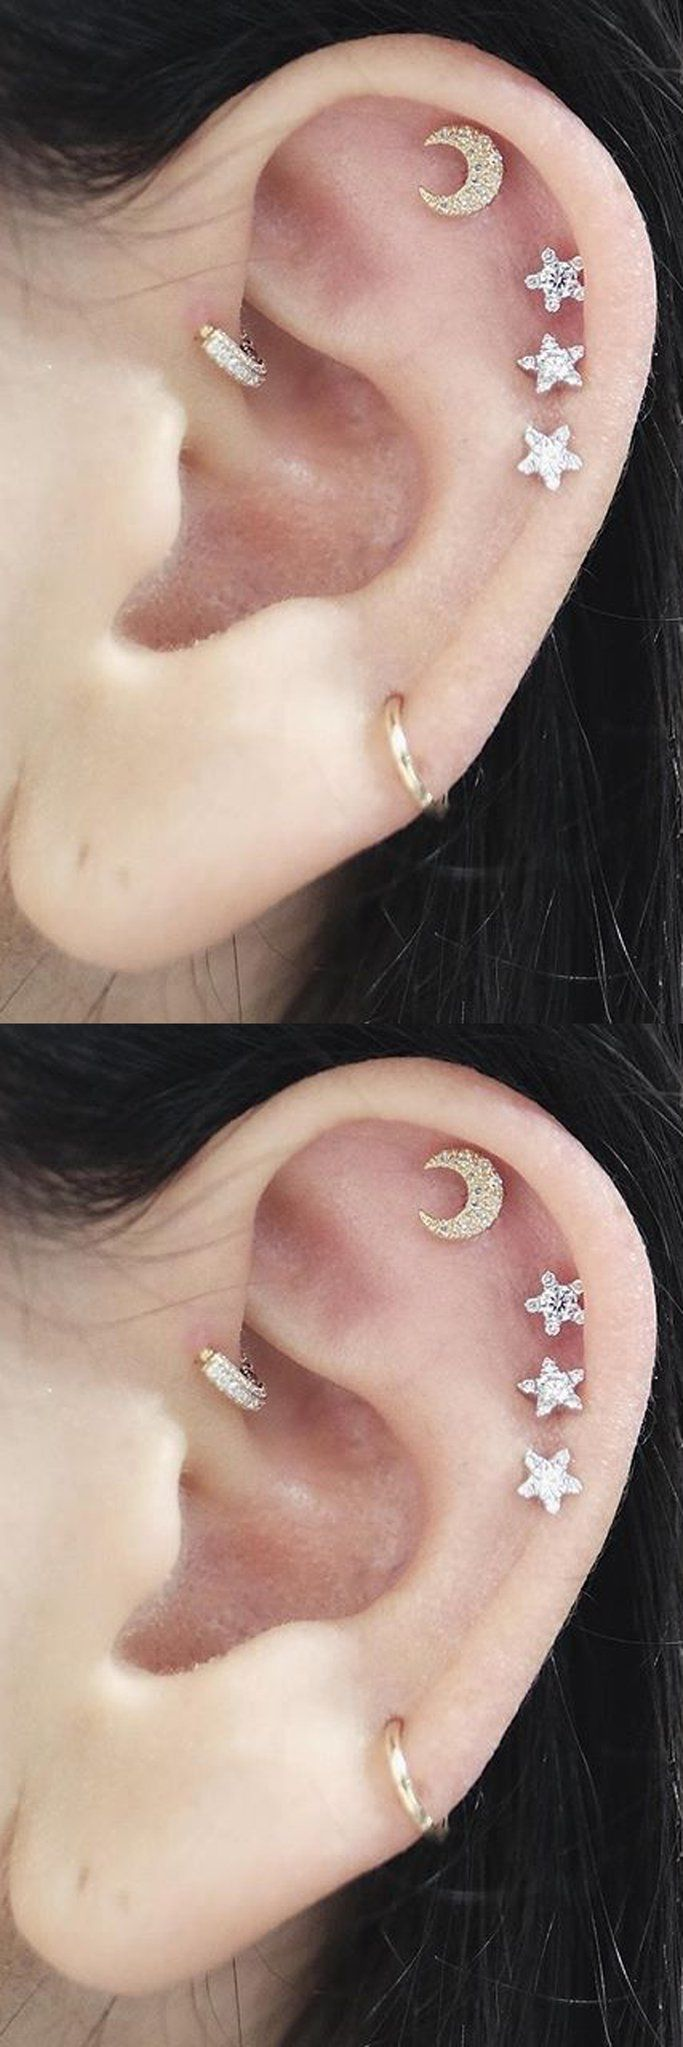 Cute Feminine Multiple Ear Piercing Combination Ideas at MyBodiArt.com - Crescent Moon and Stars Sky Cartilage Helix Earring Studs